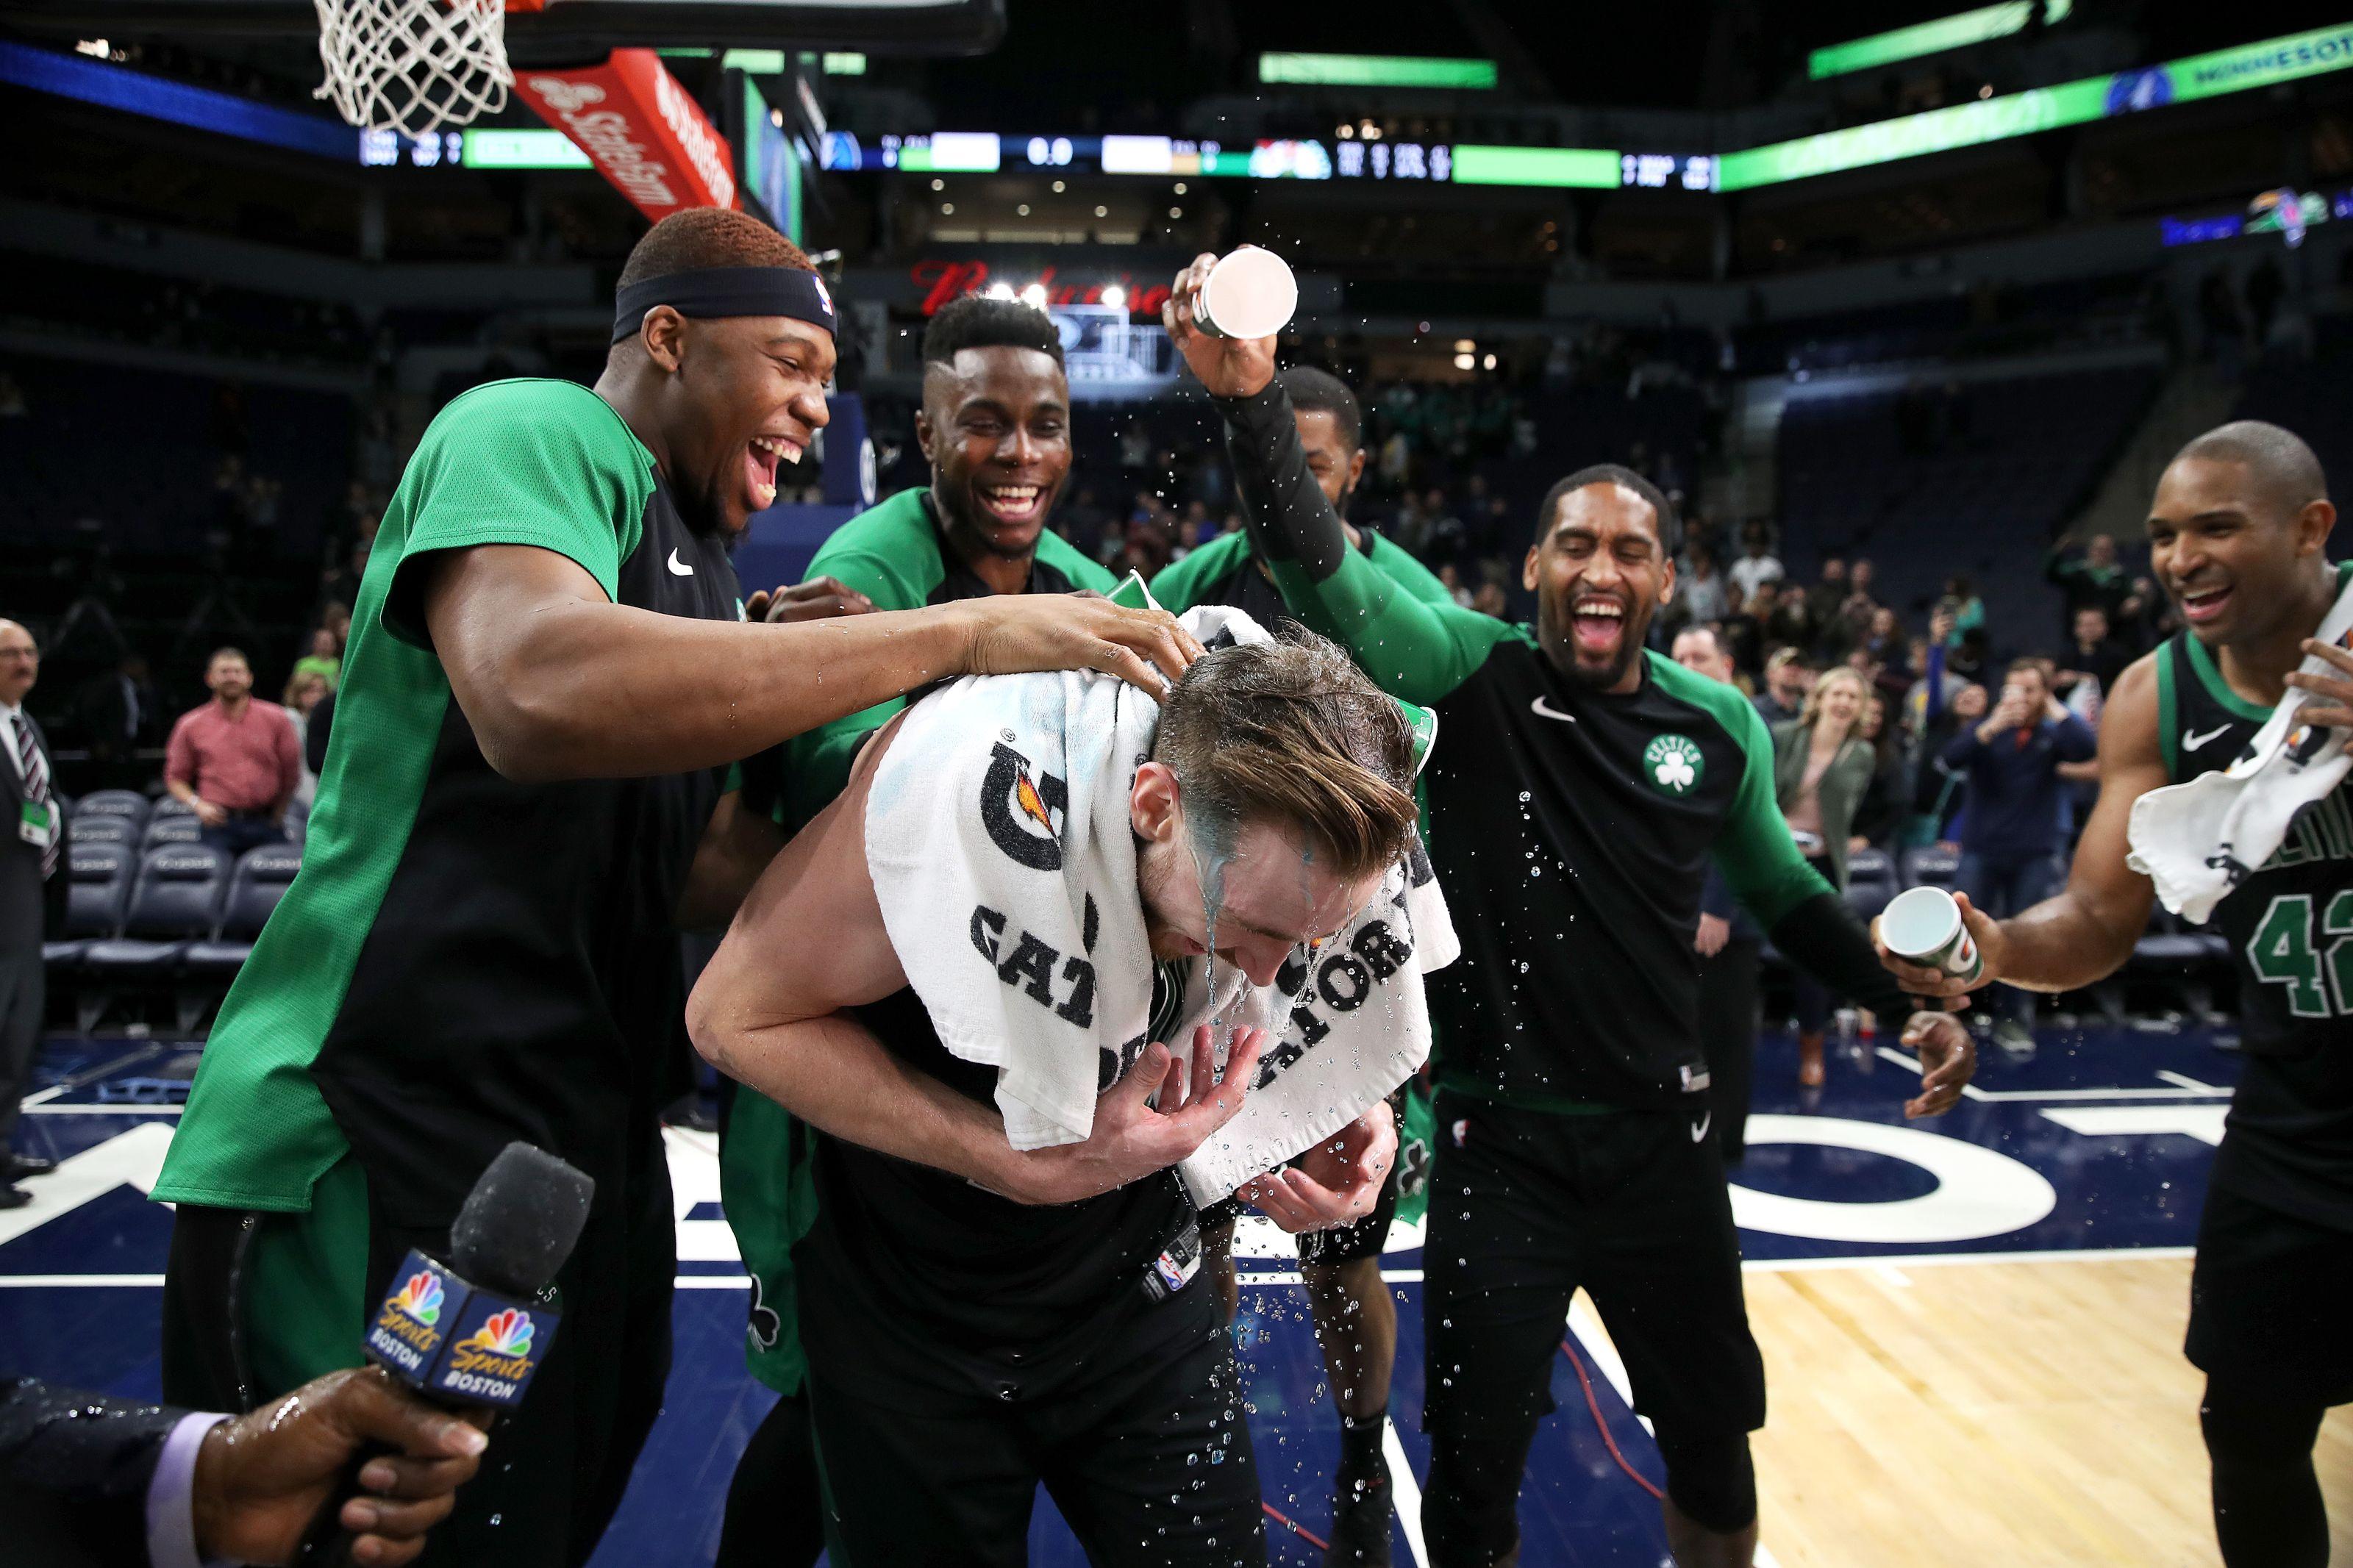 Boston Celtics: 3 Reasons the Team is Finally Hitting Their Stride